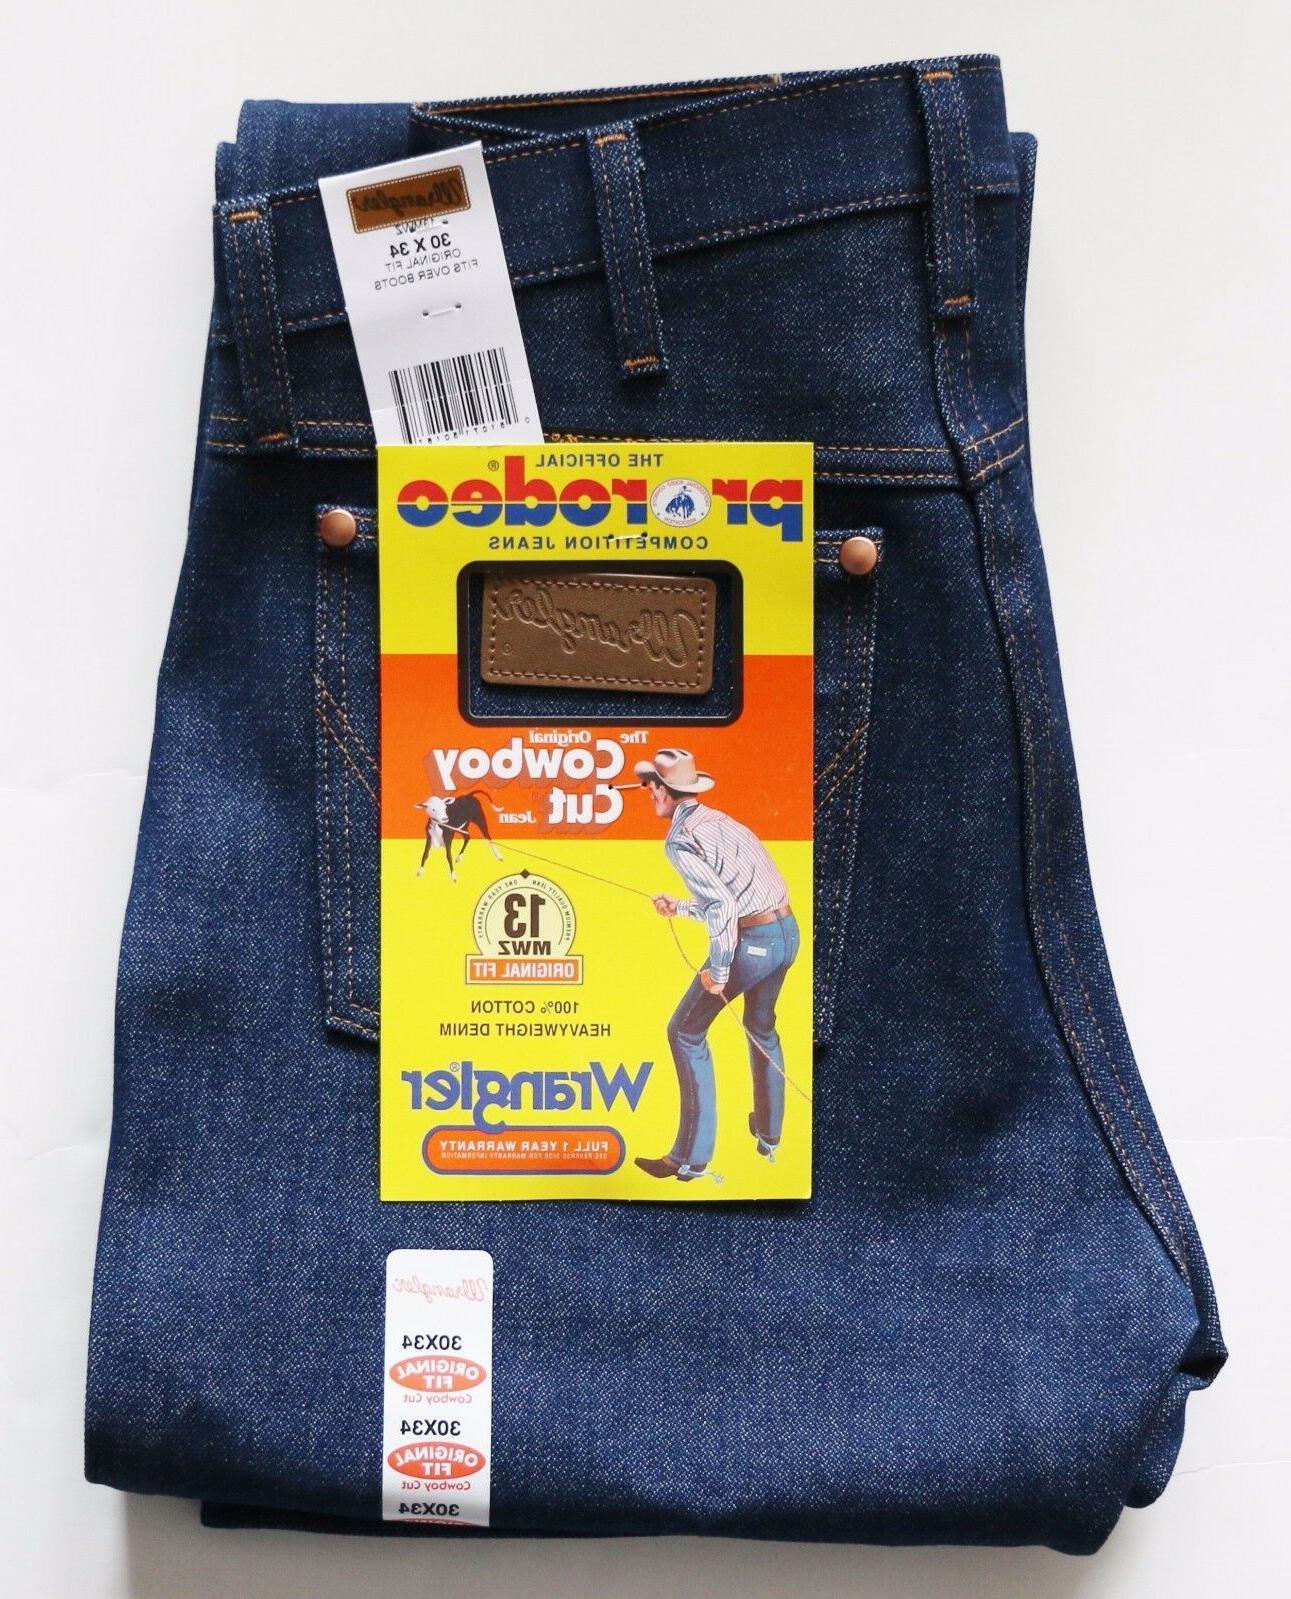 new cowboy cut 13mwz original fit jeans